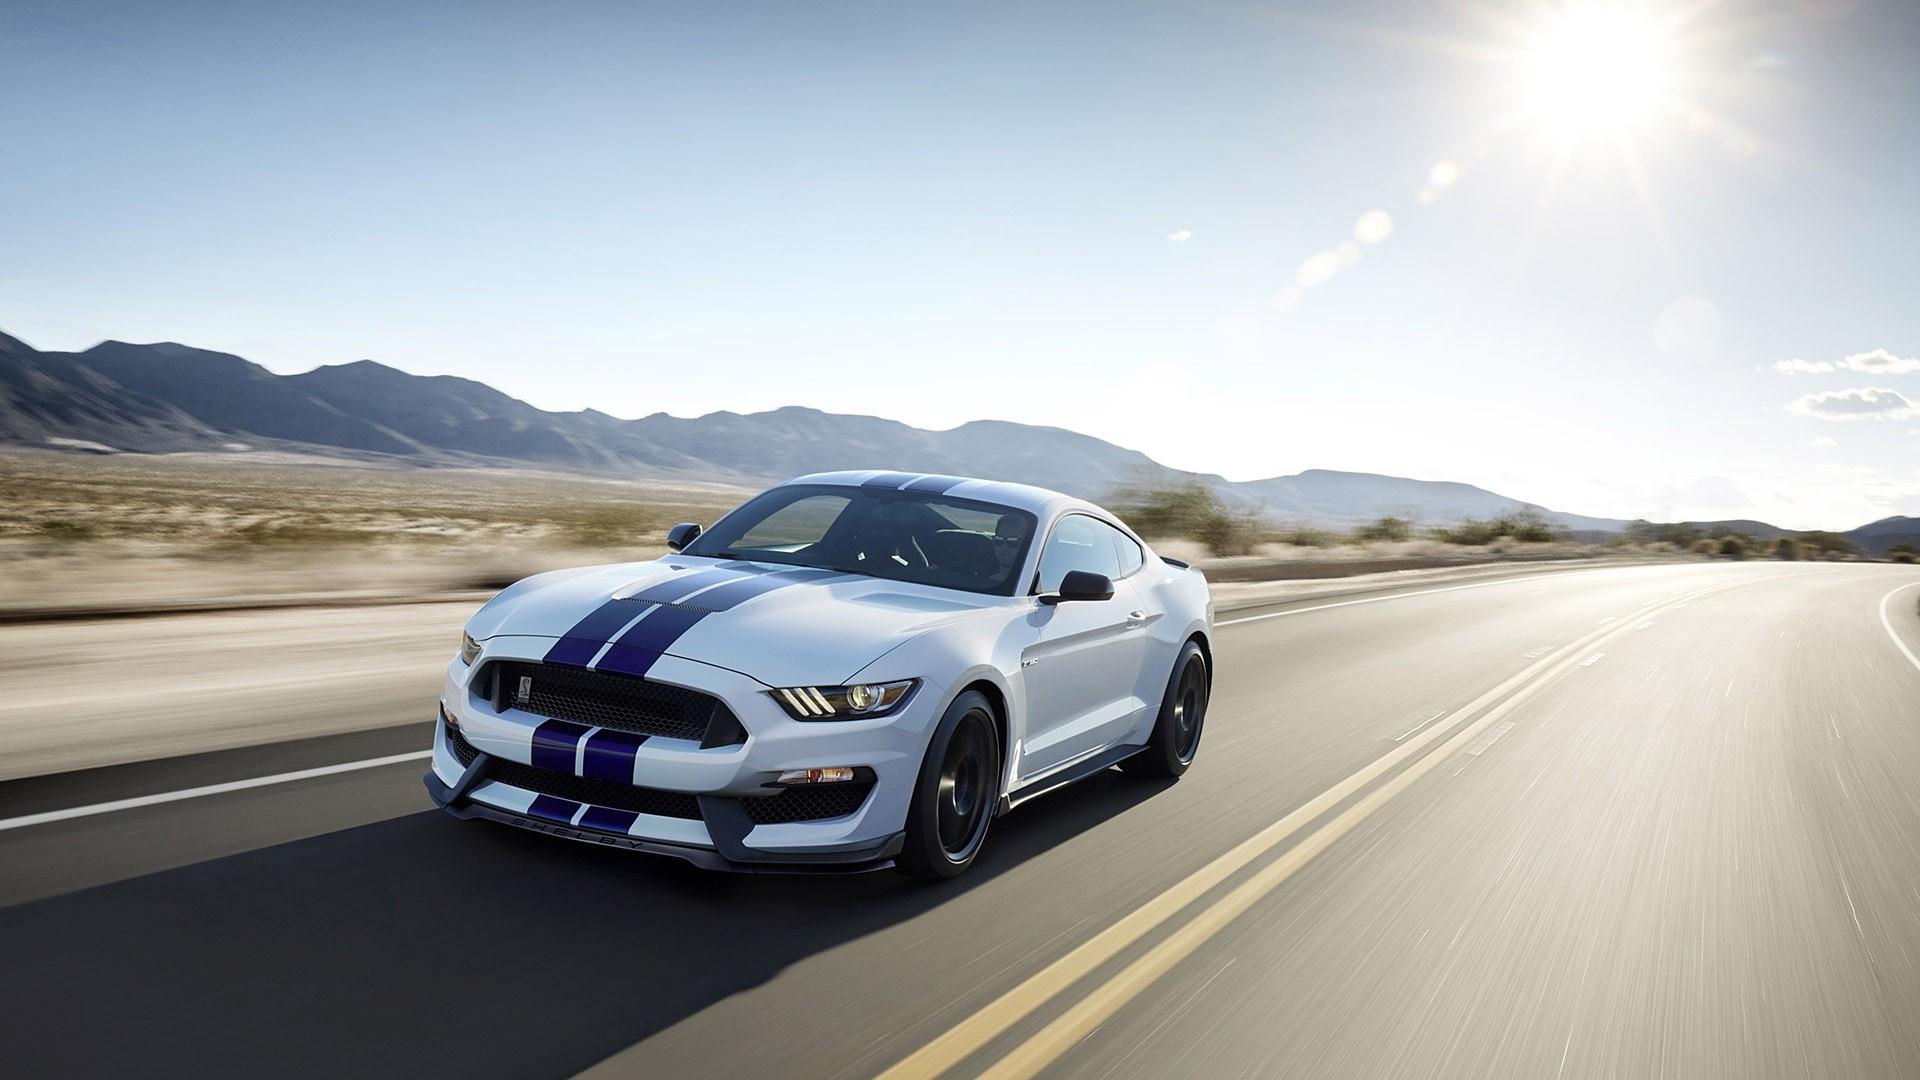 Mustang Wallpaper Free Download